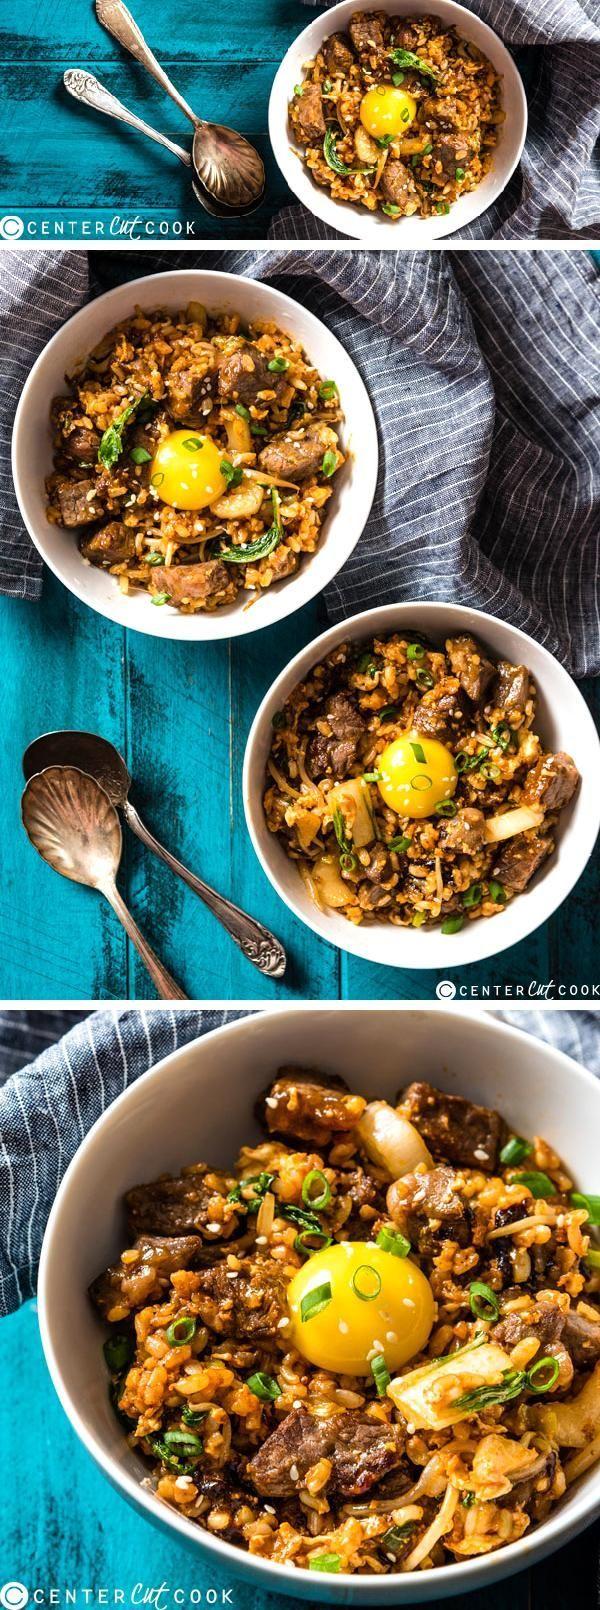 107 best images about Korean on Pinterest | Kimchi recipe, Pork ...